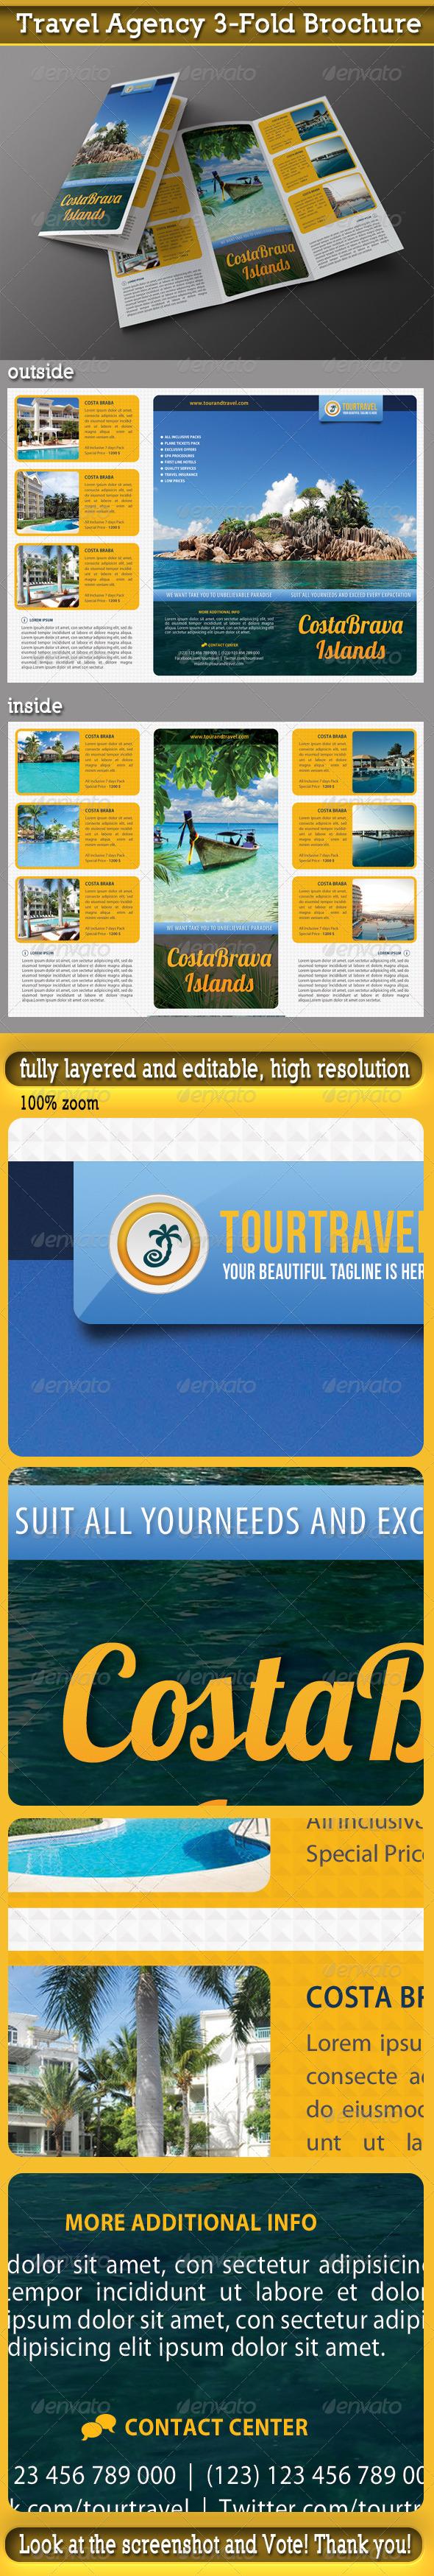 Travel Agency 3-Fold Brochure 04 - Informational Brochures